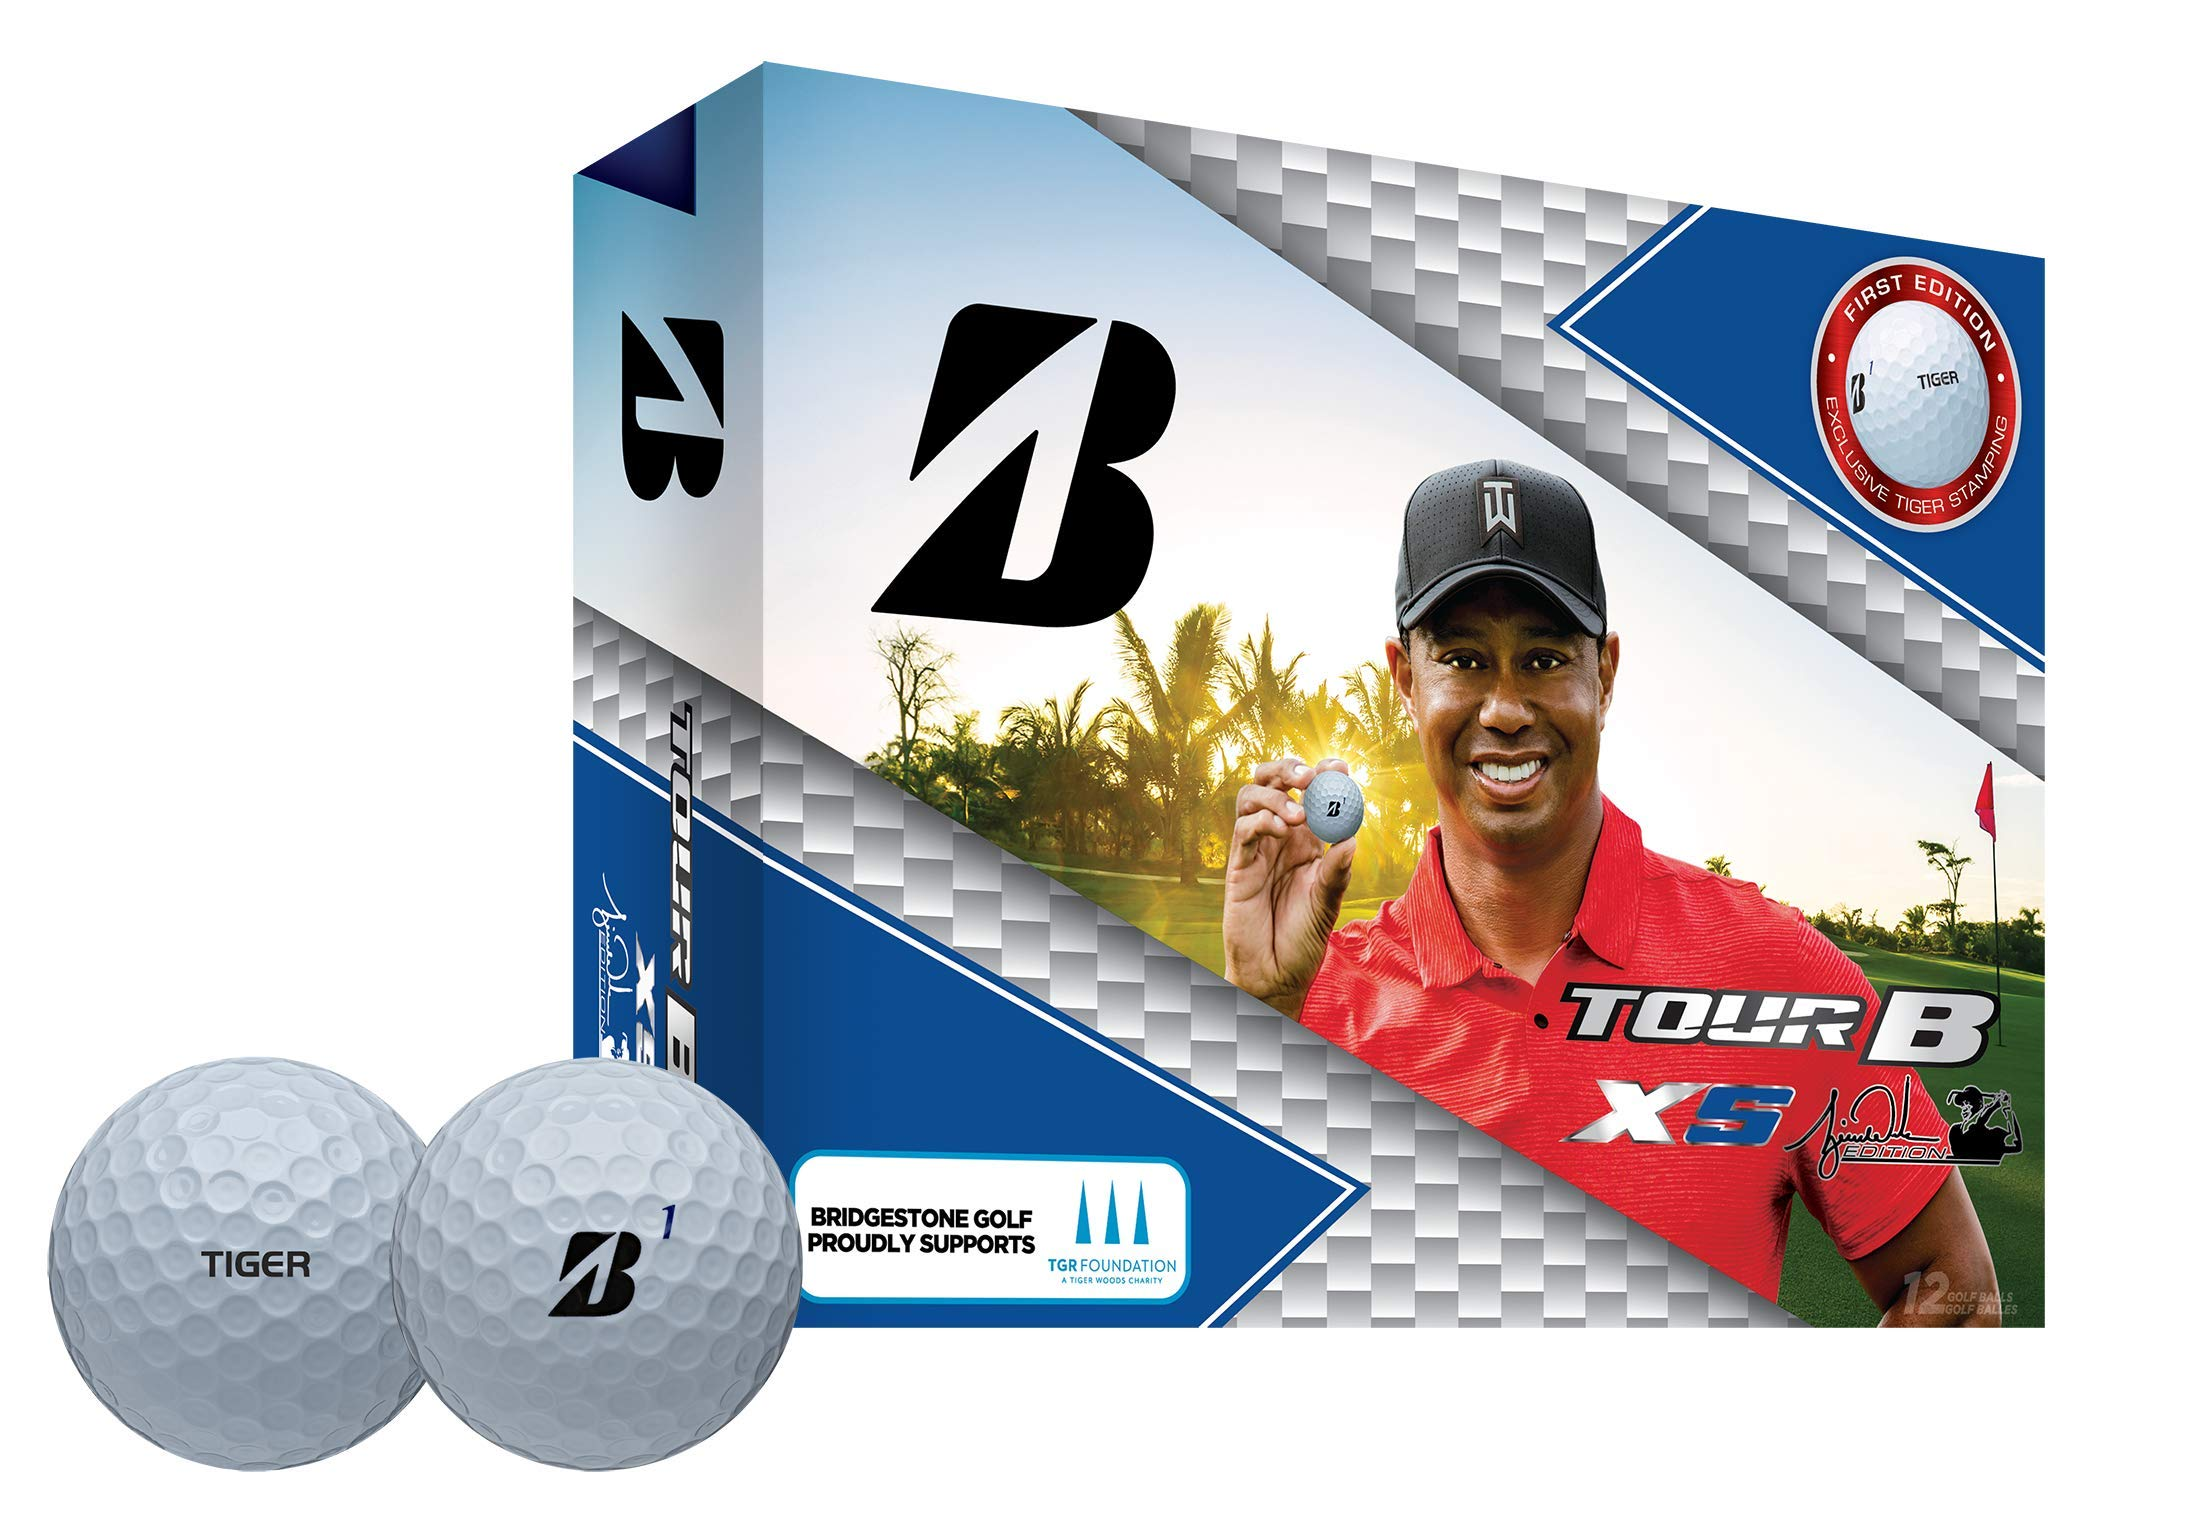 Bridgestone Tour B XS Tiger Woods Edition Golf Balls (One Dozen) Packaging may vary